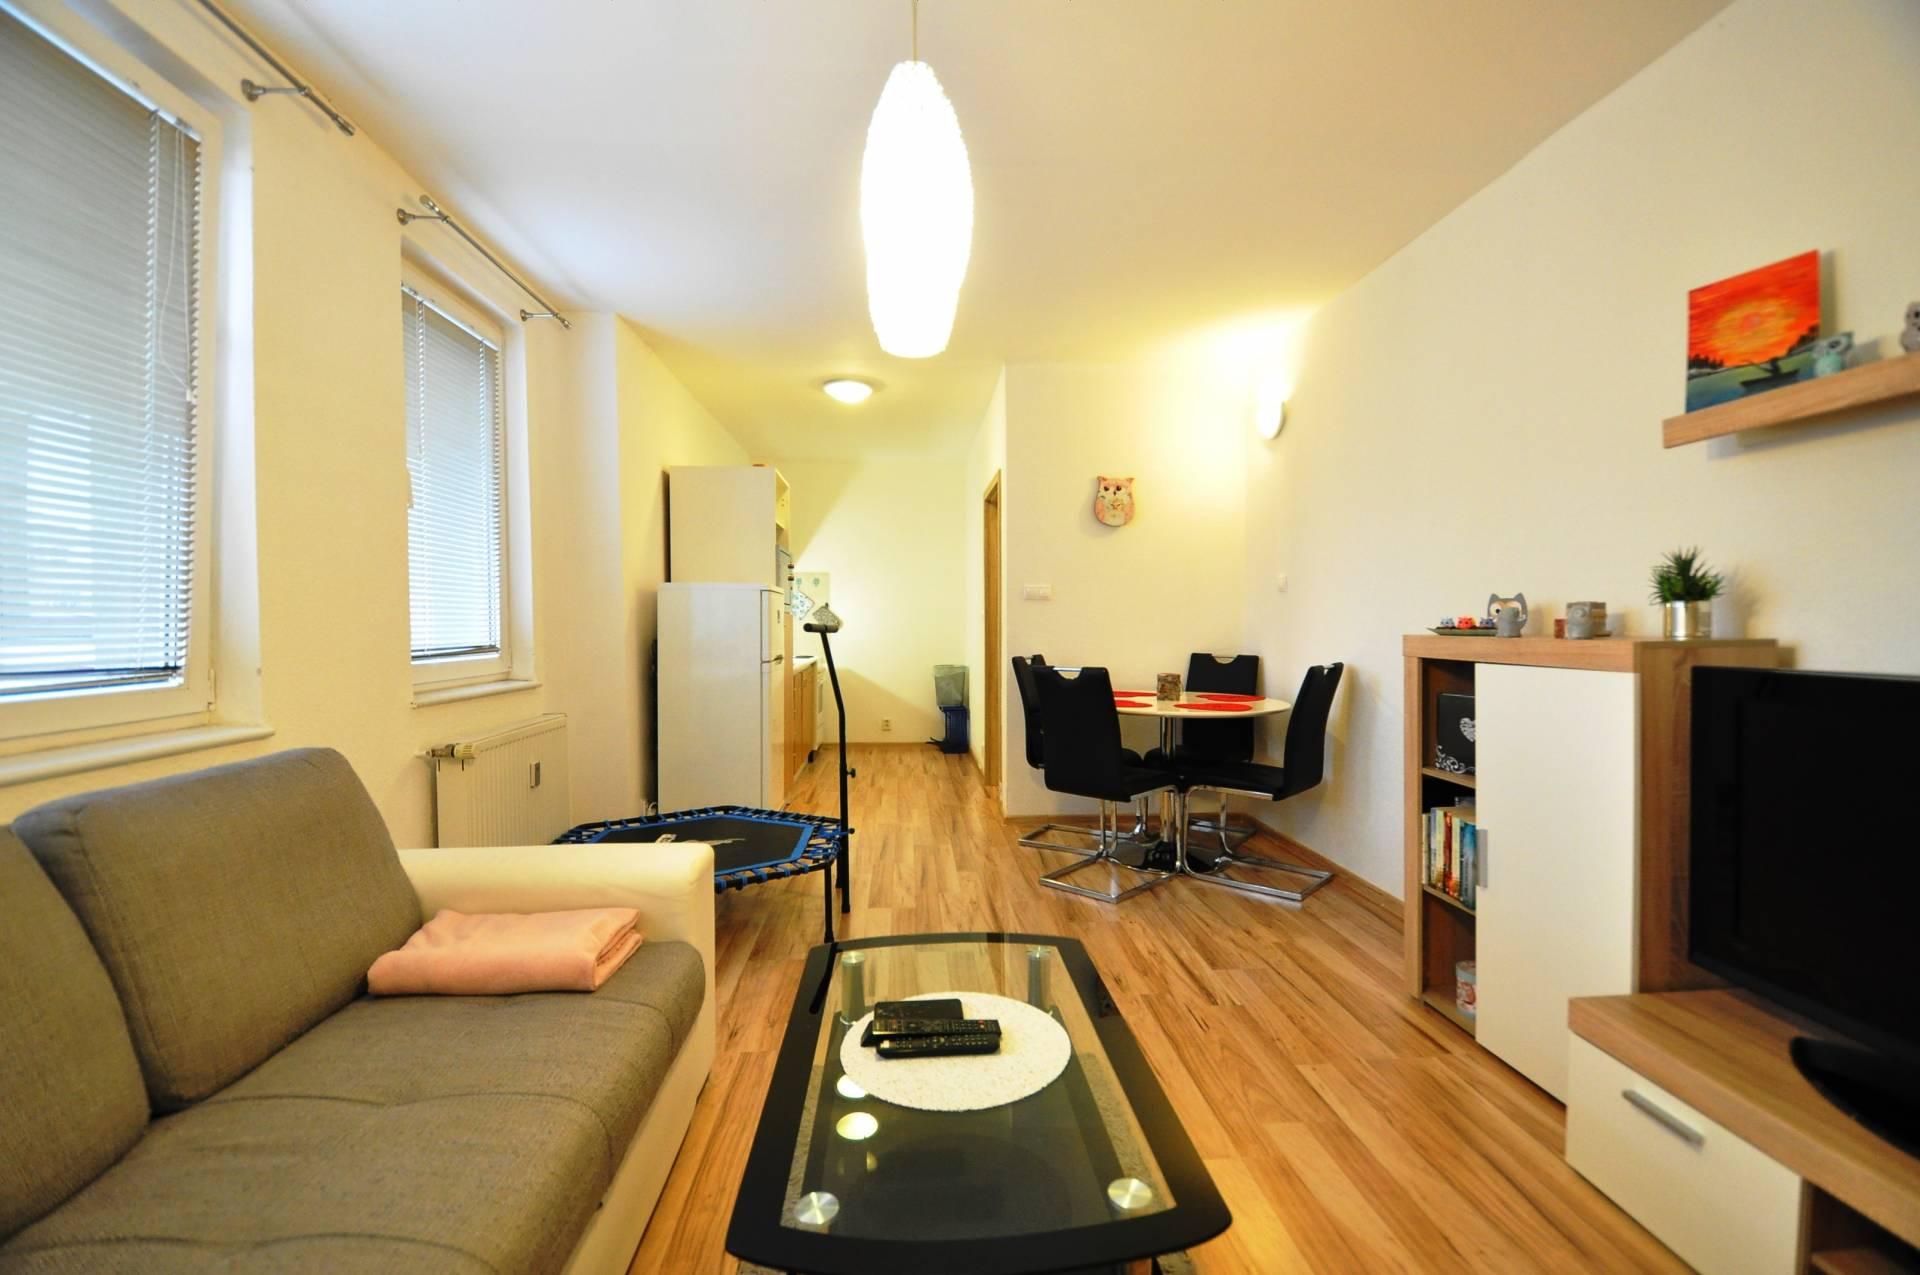 PRENÁJOM, 2-izbový byt, Poprad, Ul. Ludvíka Svobodu,